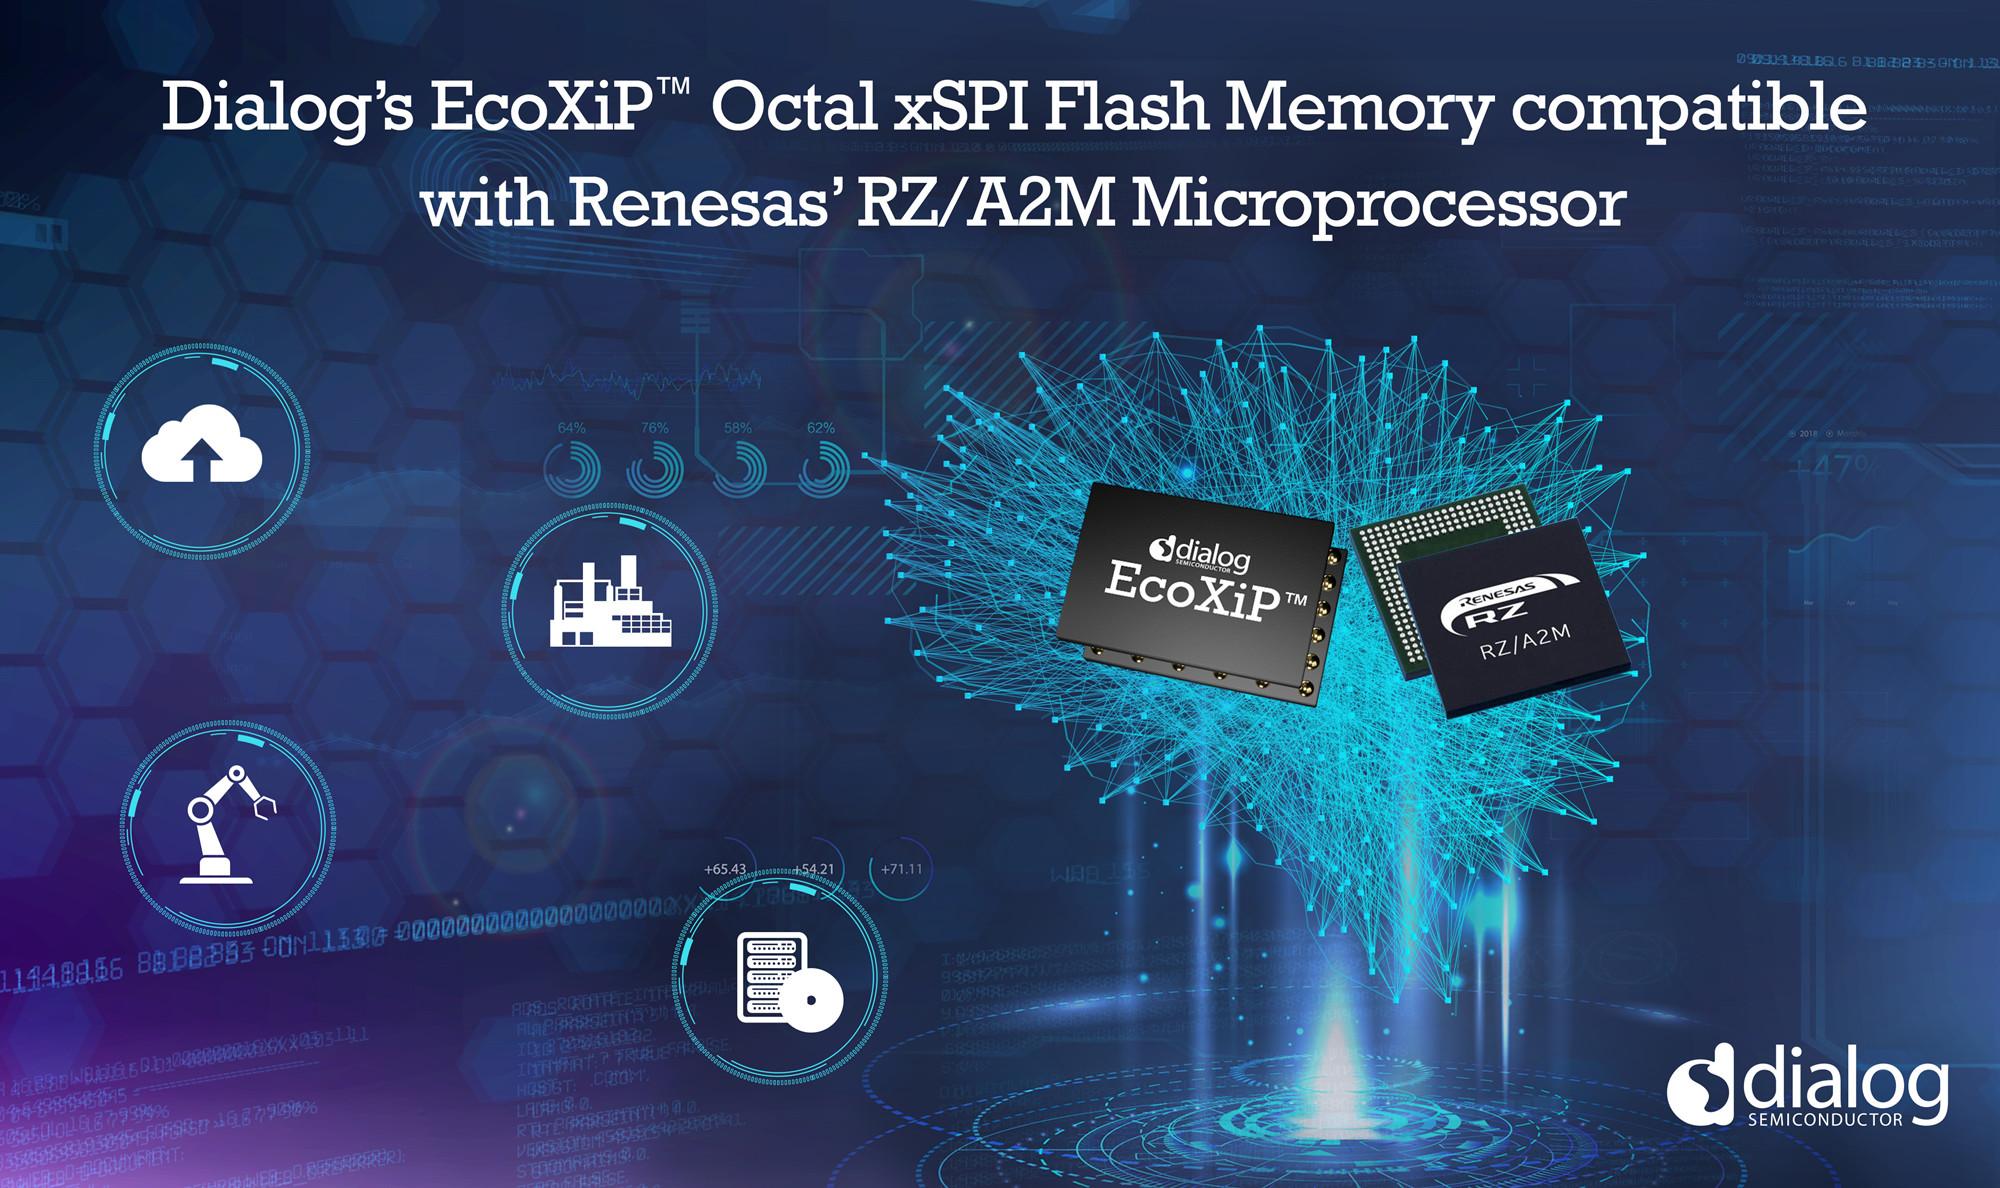 Dialog宣布其EcoXiP™ Octal xSPI闪存兼容瑞萨高性能RZ/A2M微处理器